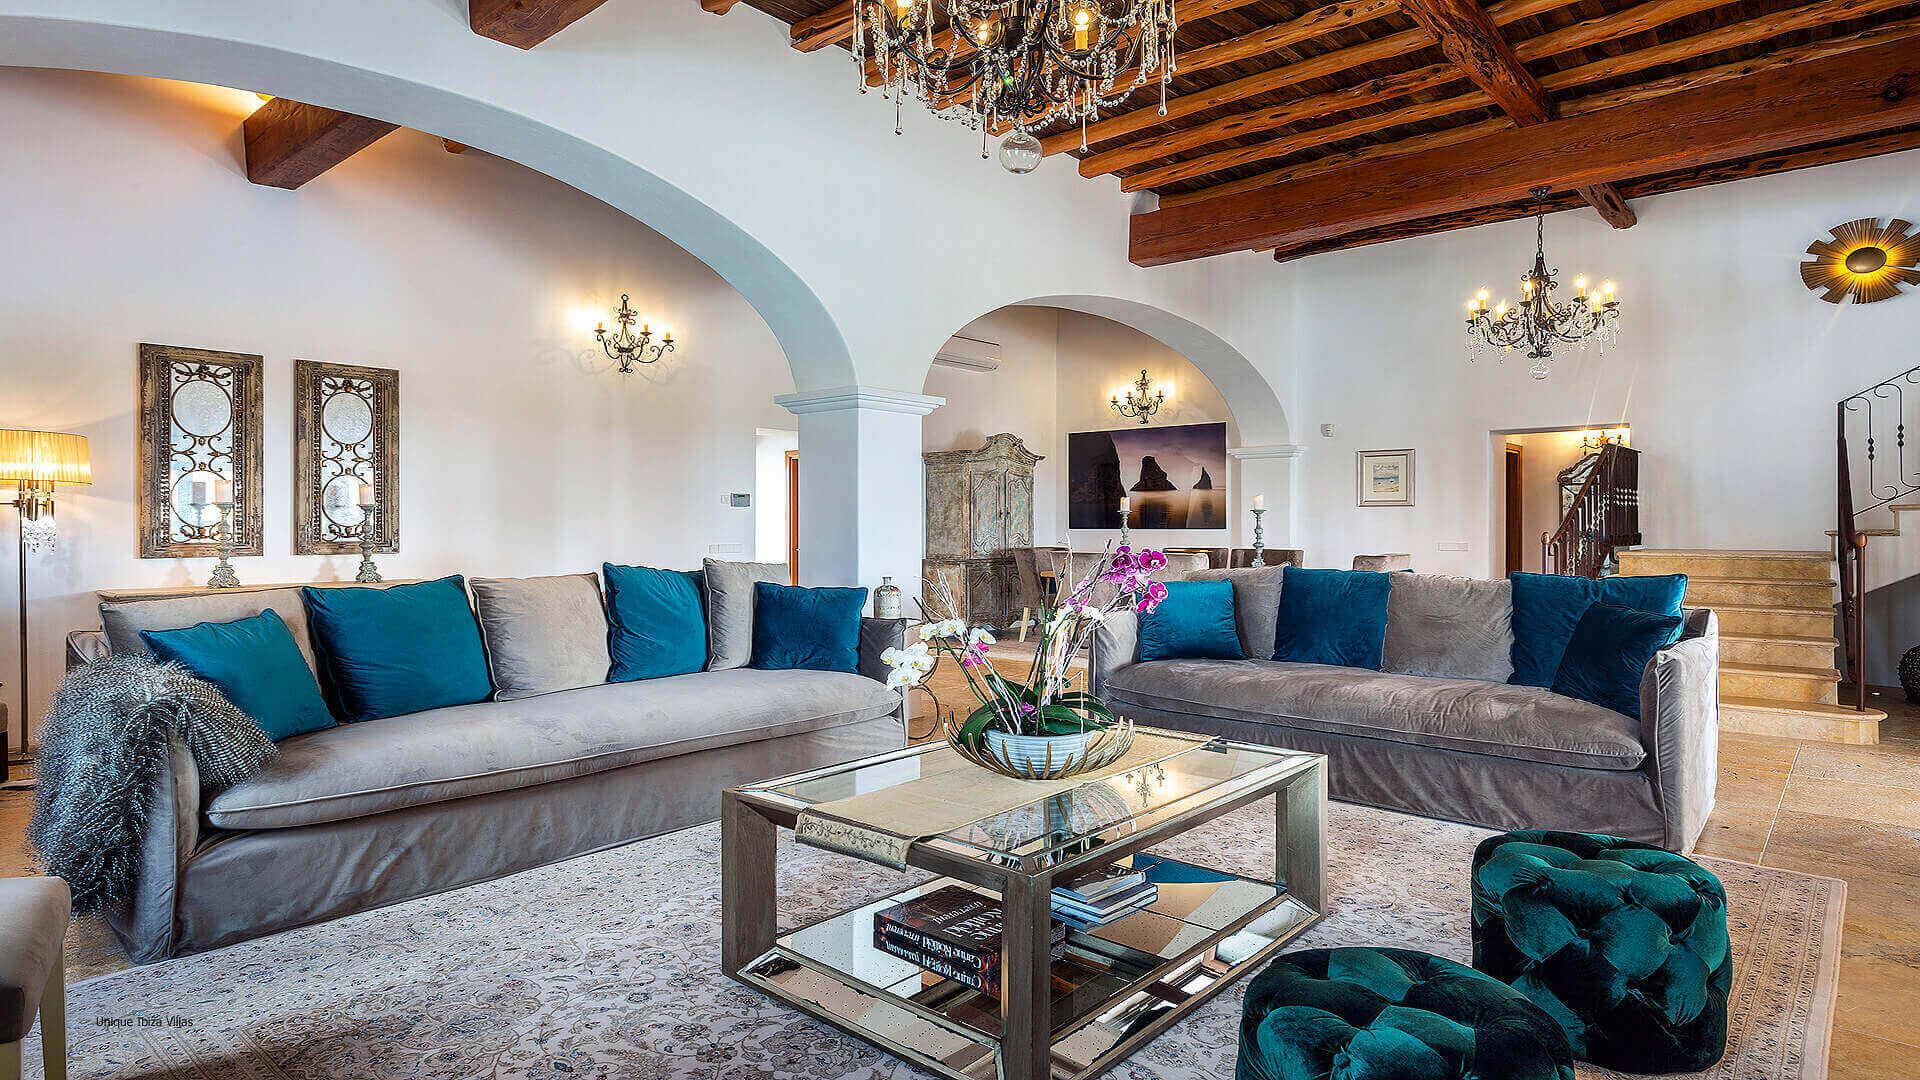 Casa Prats Ibiza 27 Santa Eulalia